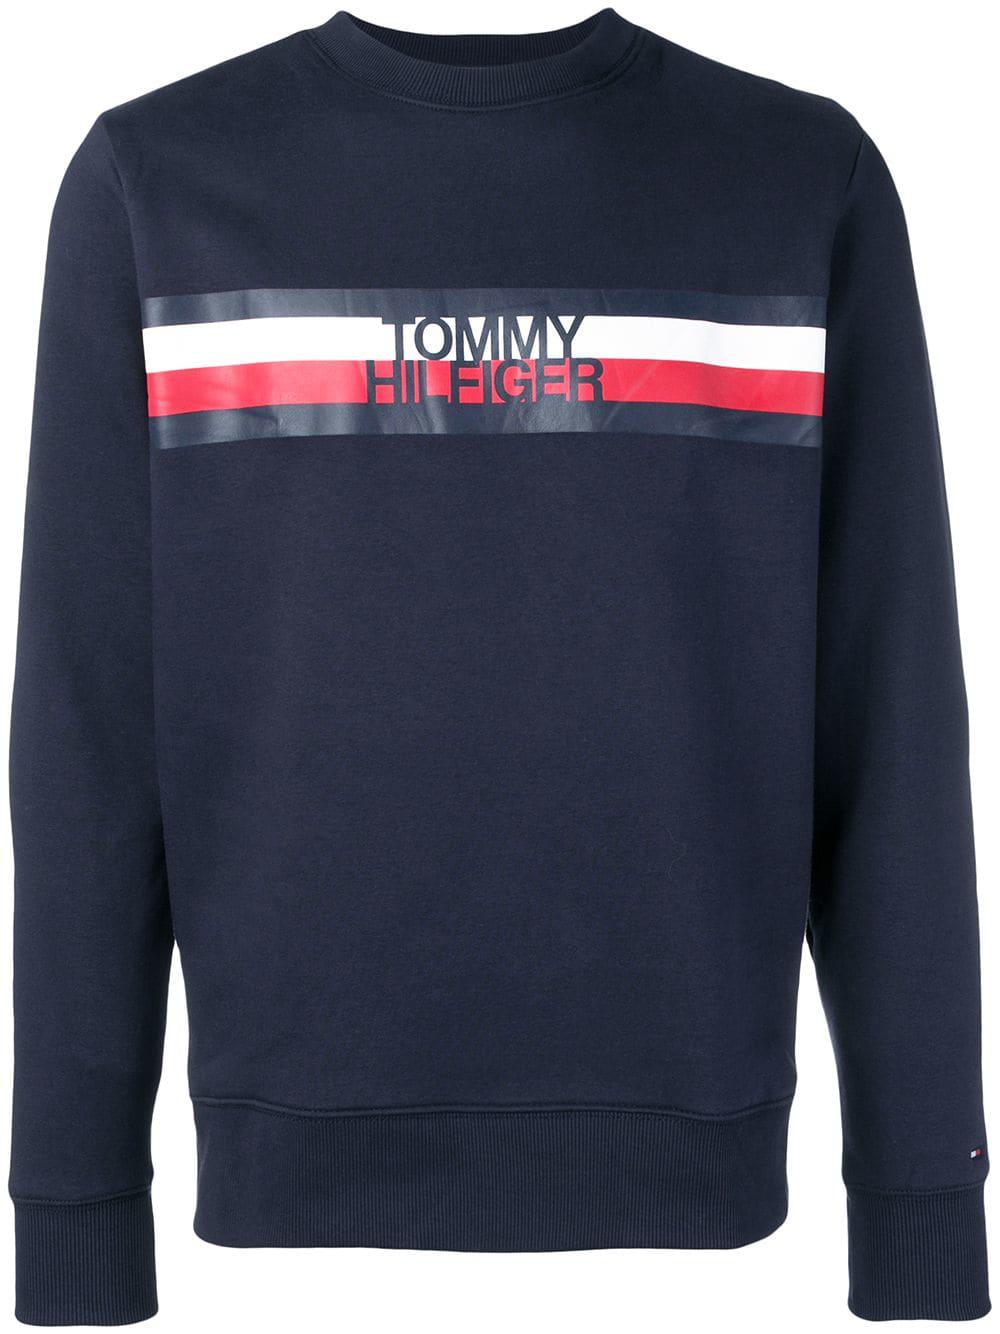 41765a93 Tommy Hilfiger Striped Logo Sweatshirt - Blue | ModeSens